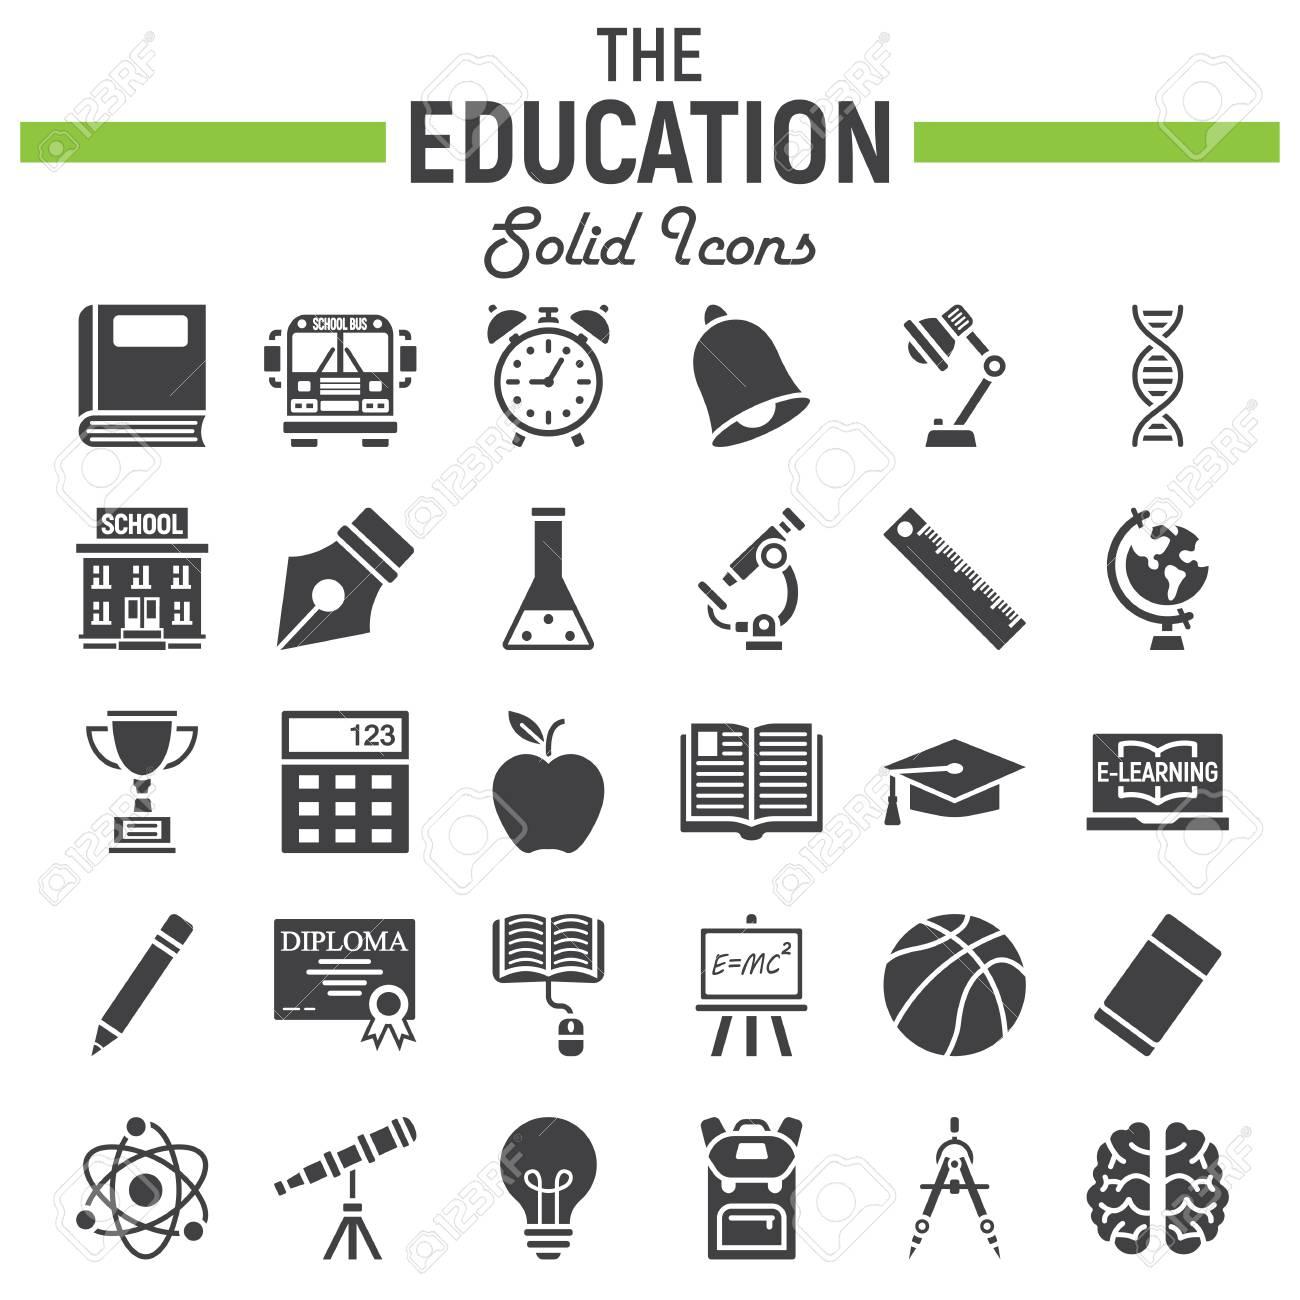 Education solid icon set school symbols collection knowledge education solid icon set school symbols collection knowledge vector sketches logo illustrations buycottarizona Image collections